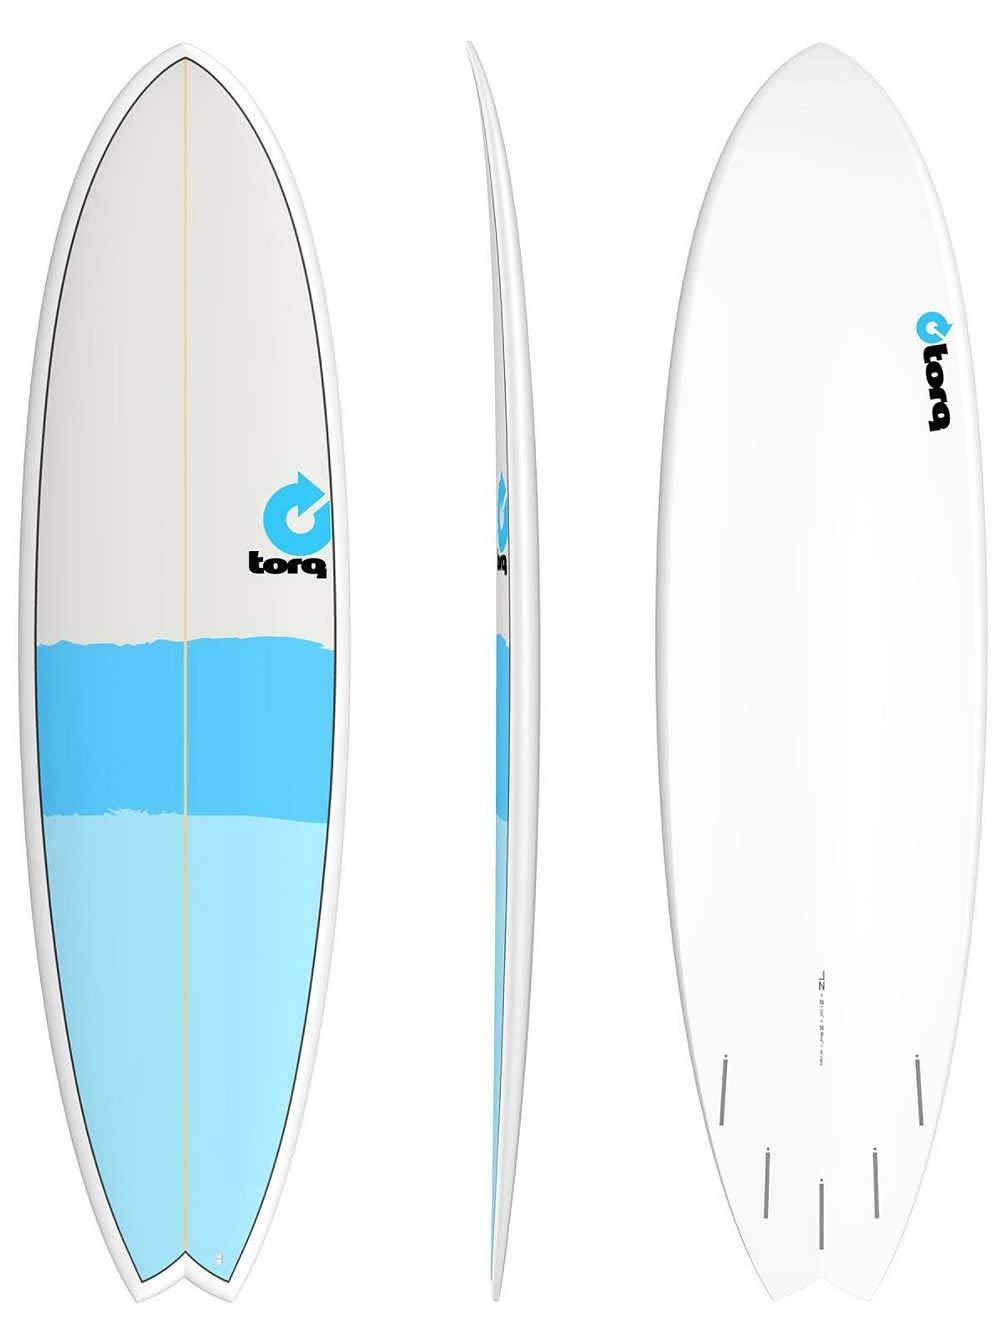 Tabla de Surf Torq Tet 7.2 Fish New Classic: Amazon.es: Deportes y ...